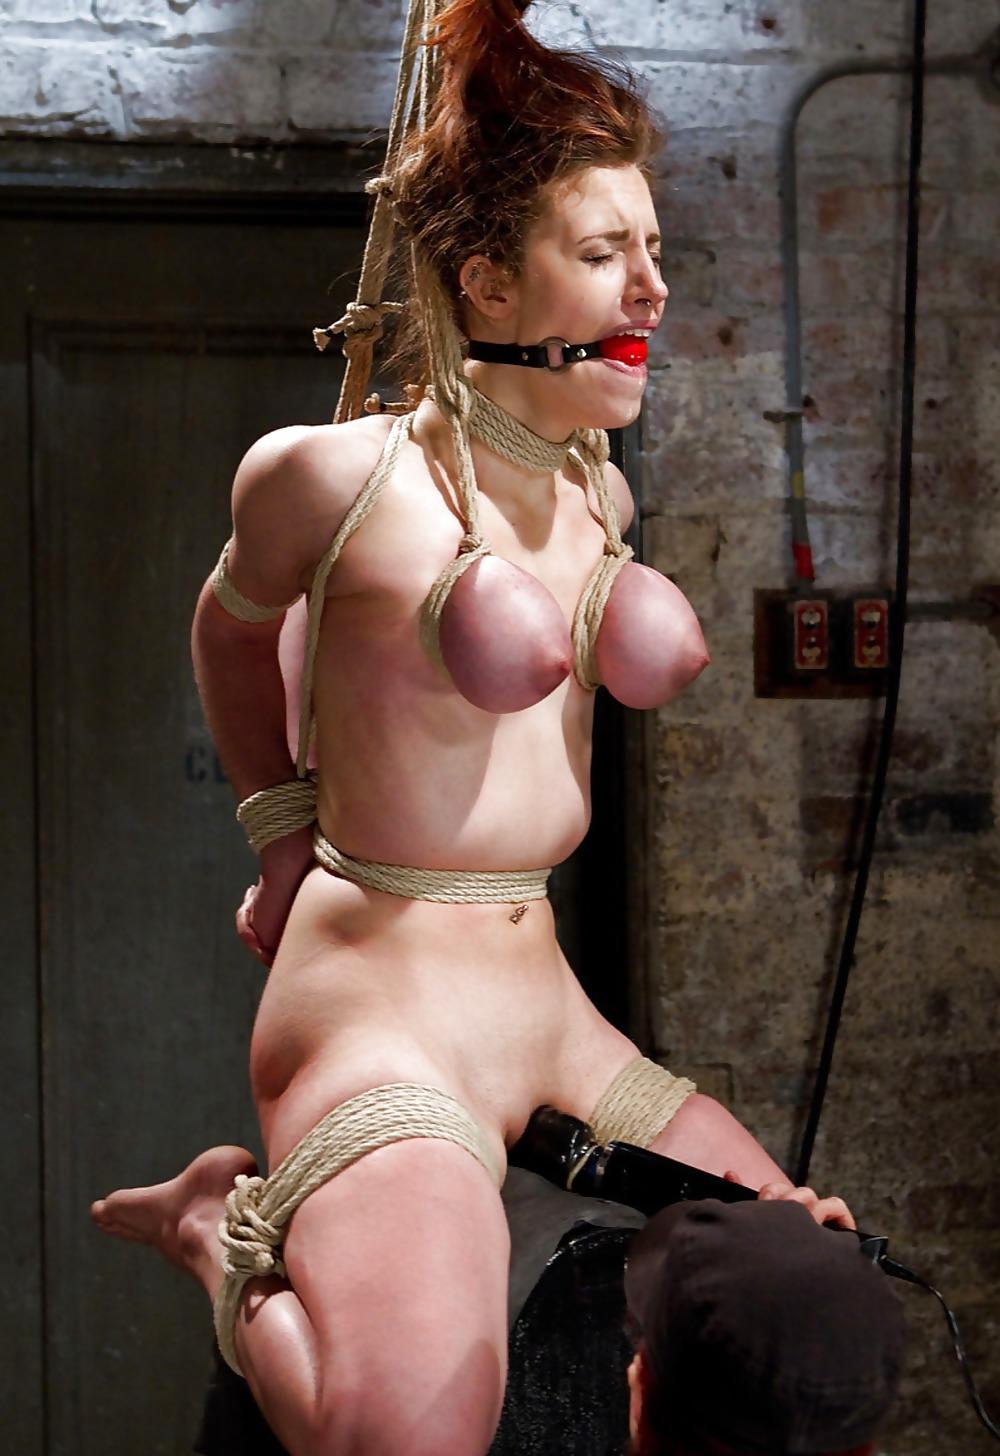 Sybian bondage pics, sunny leone nude and penis